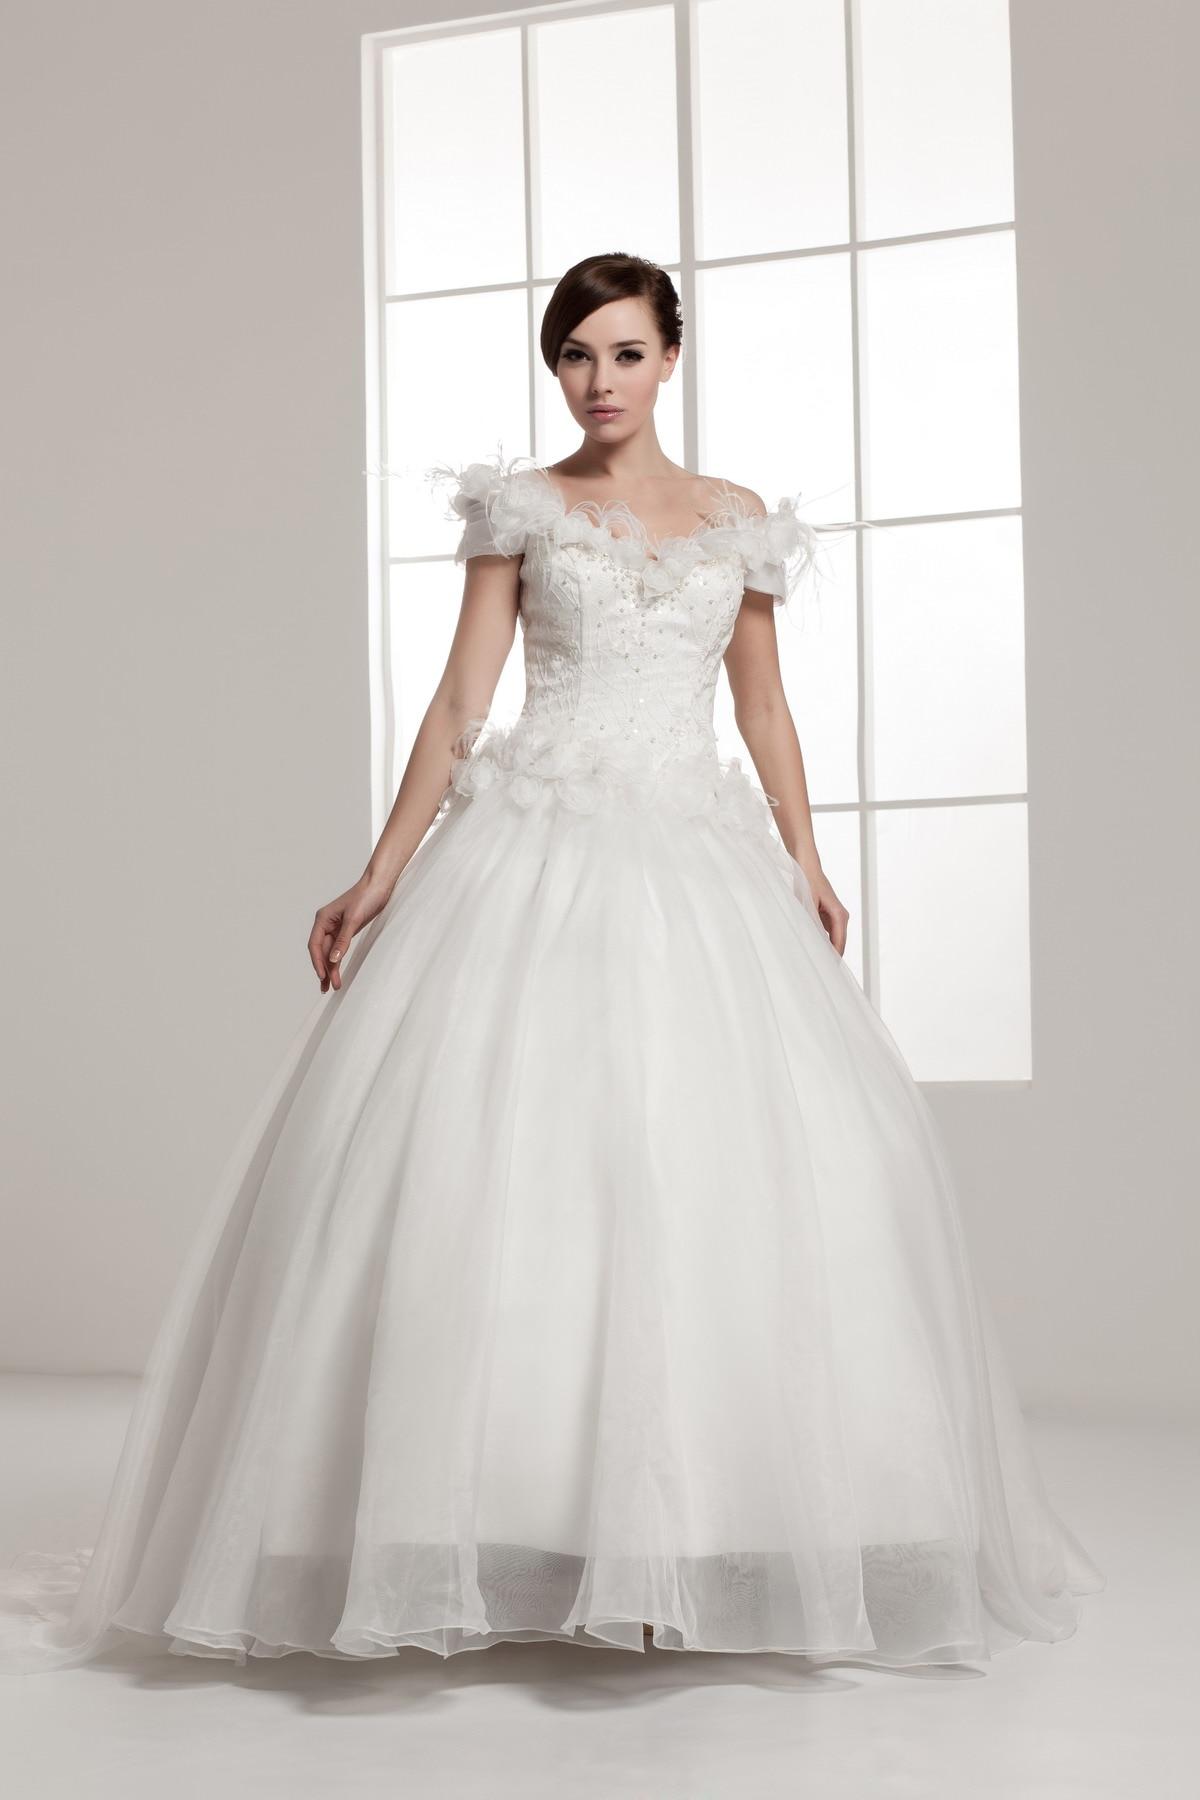 Aliexpress.com : Buy fairy tale cinderella wedding dress with ...